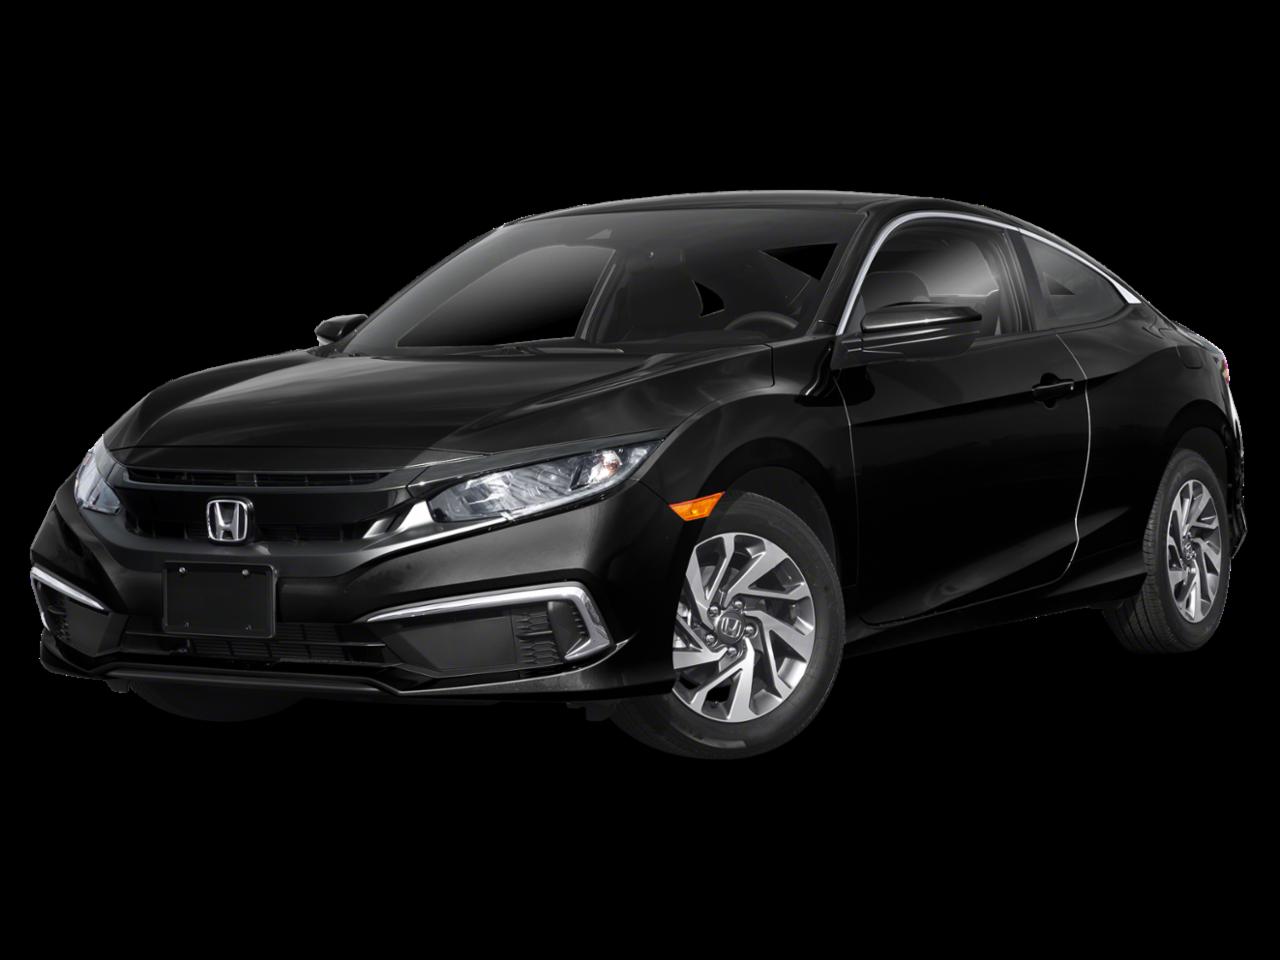 Honda 2019 Civic Coupe LX